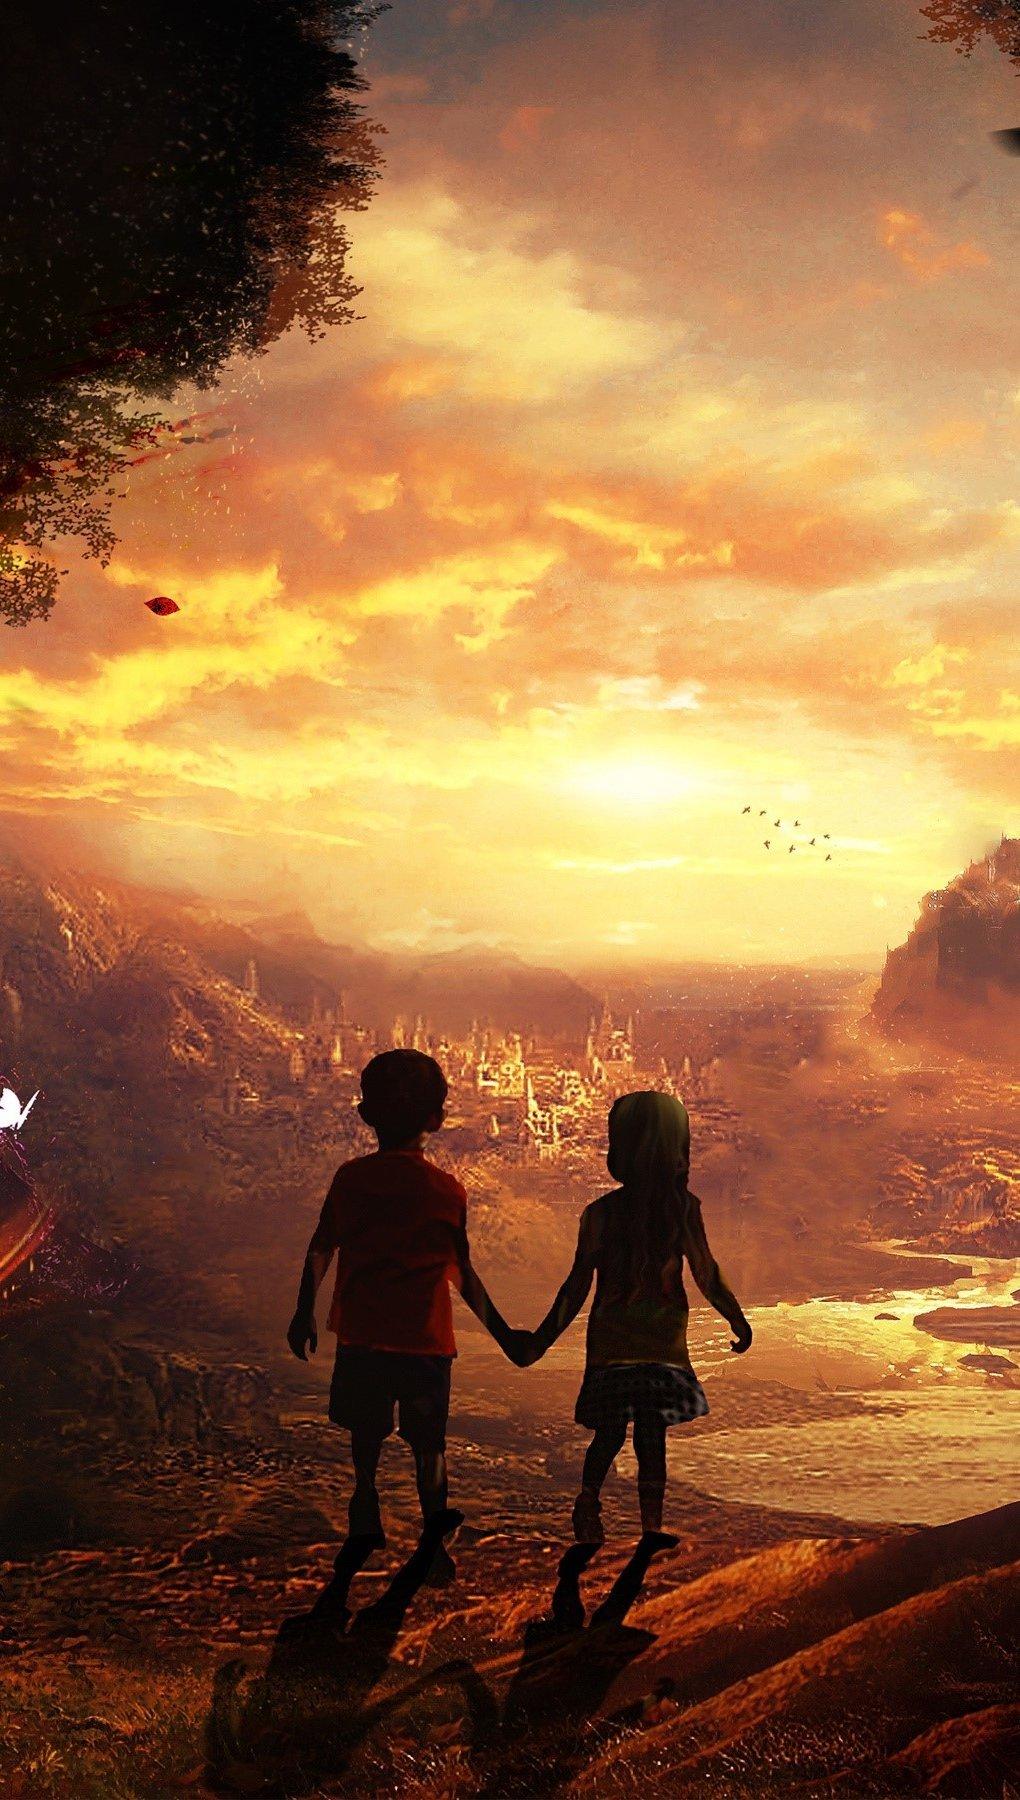 Wallpaper Children in a fairy tale Vertical